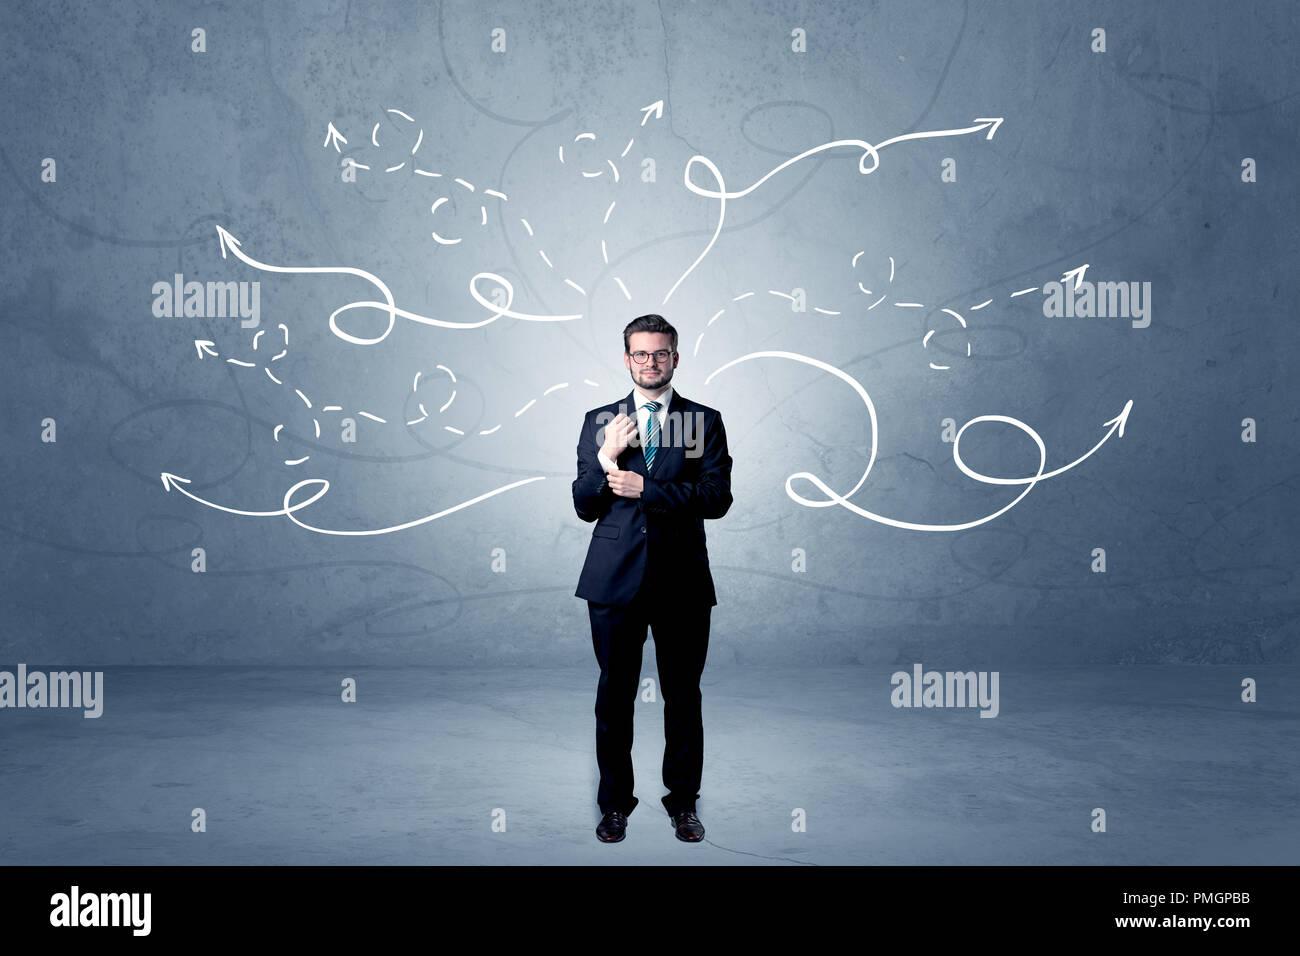 Elegant businessman choosing between directions with winding drawn arrows around   - Stock Image